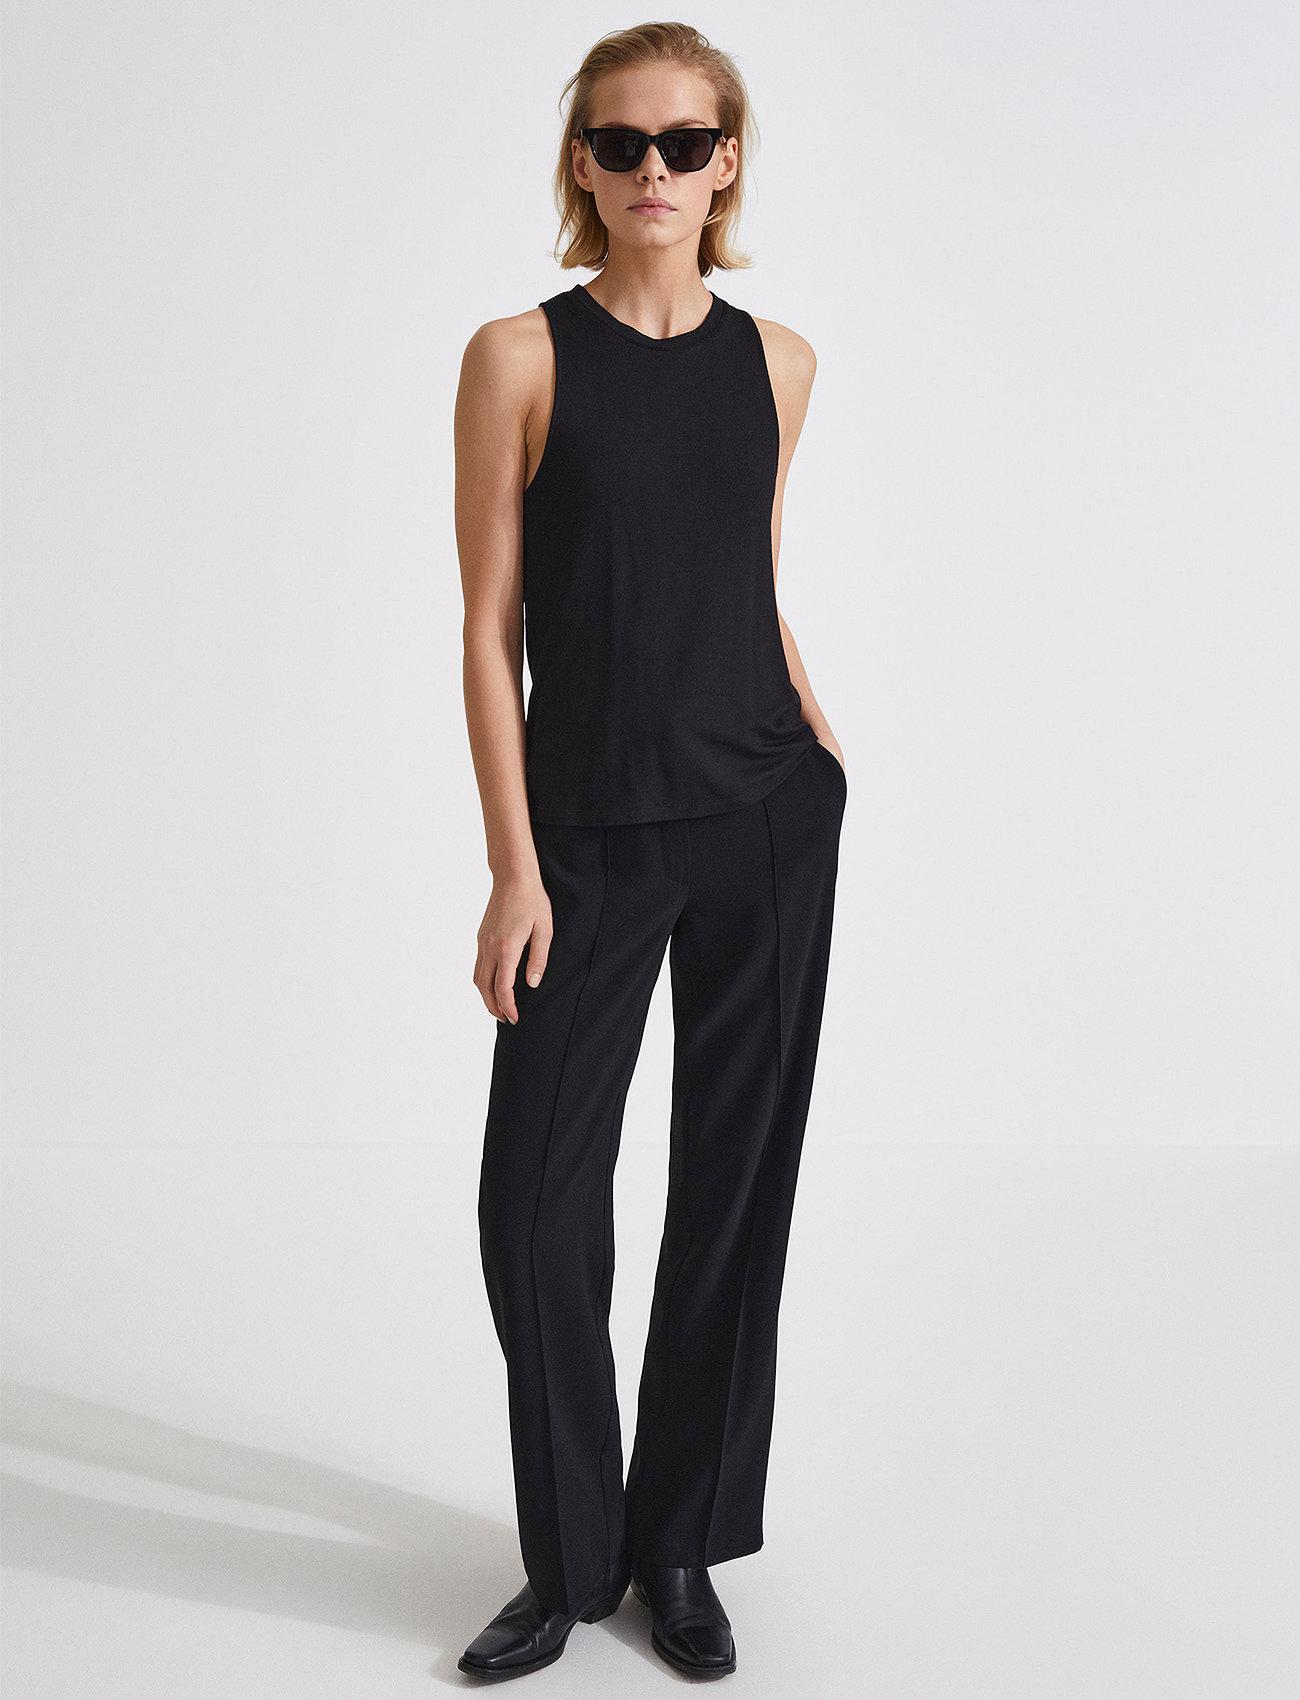 Stylein - BORIS TROUSERS - bikses ar taisnām starām - black - 0